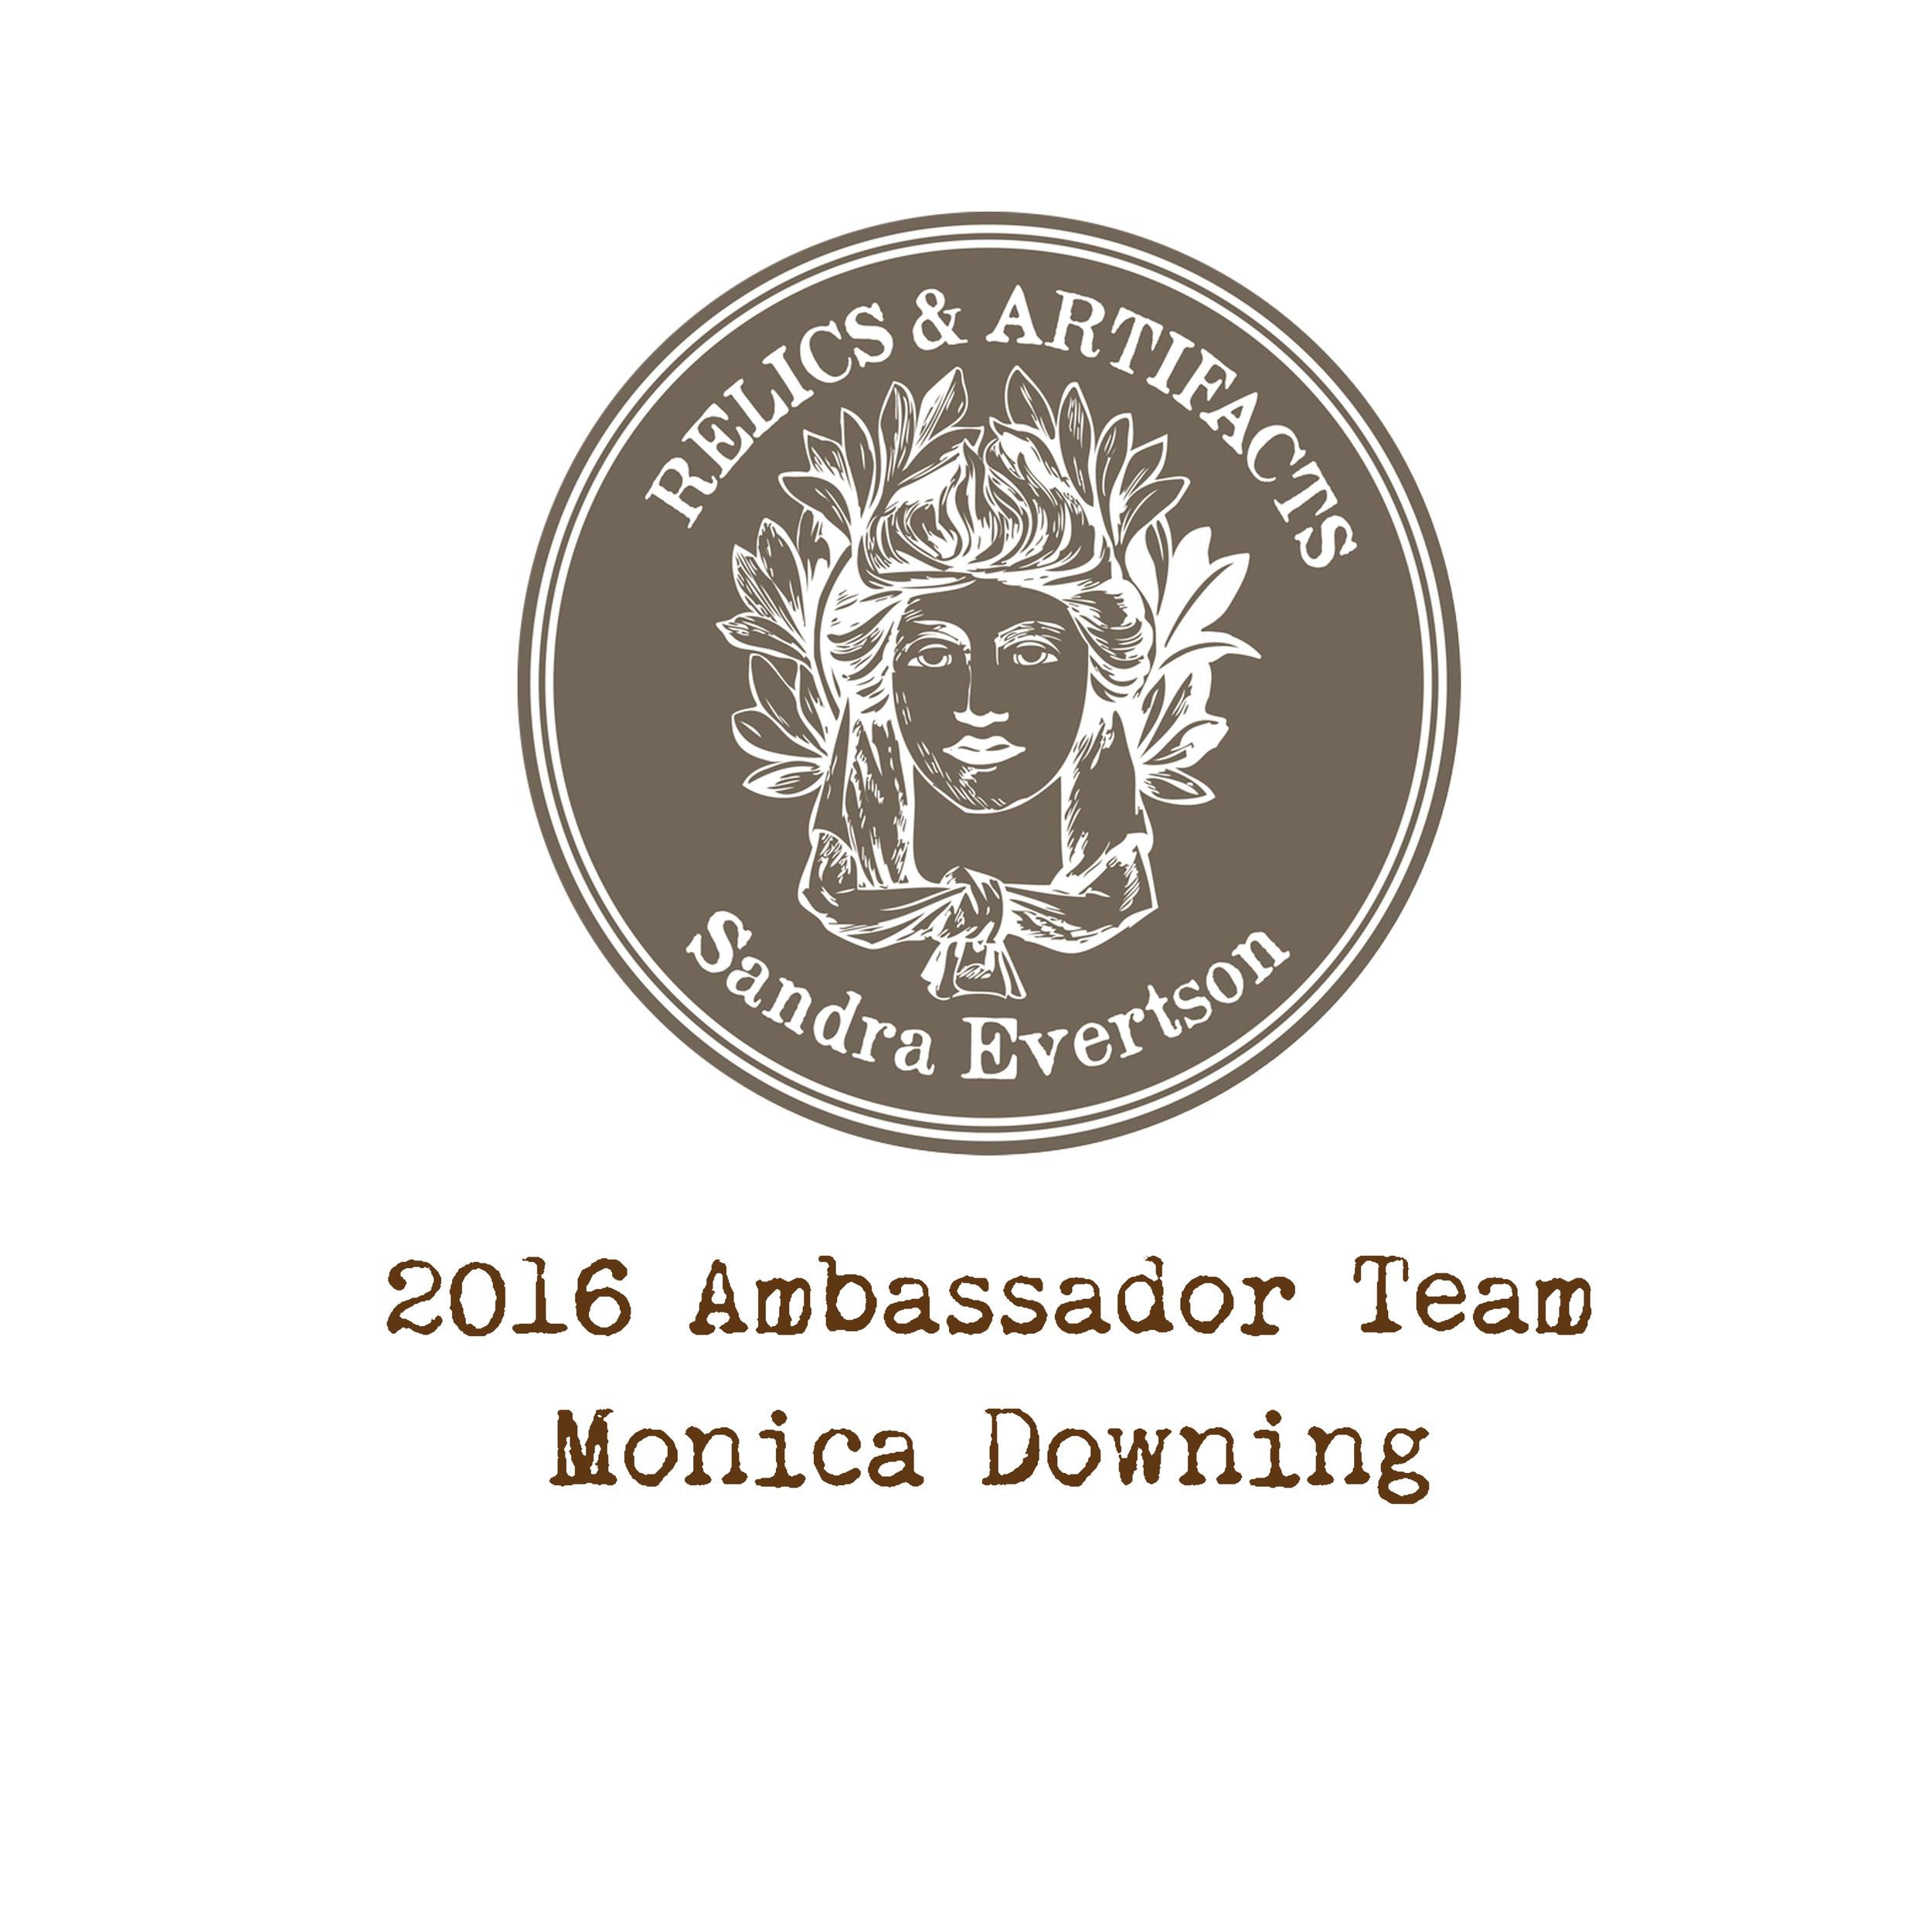 RELICS & ARTIFACTS® Ambassador Snapshot   Monica Downing